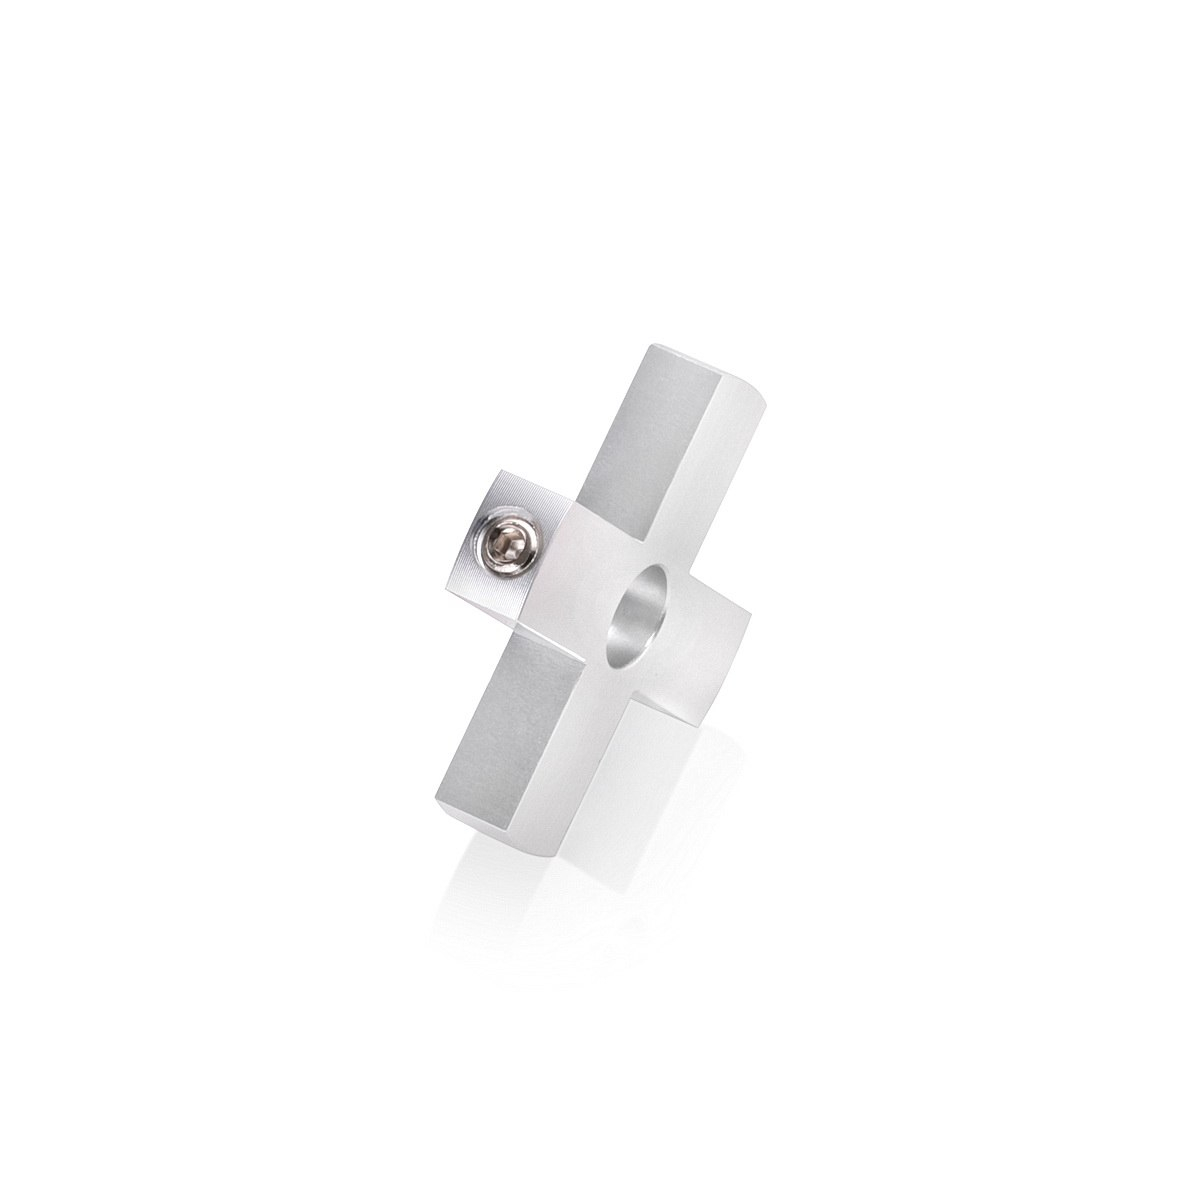 4-Way Standoffs Hub, Diameter: 1 1/2'', Thickness: 1/4'', Clear Anodized Aluminum